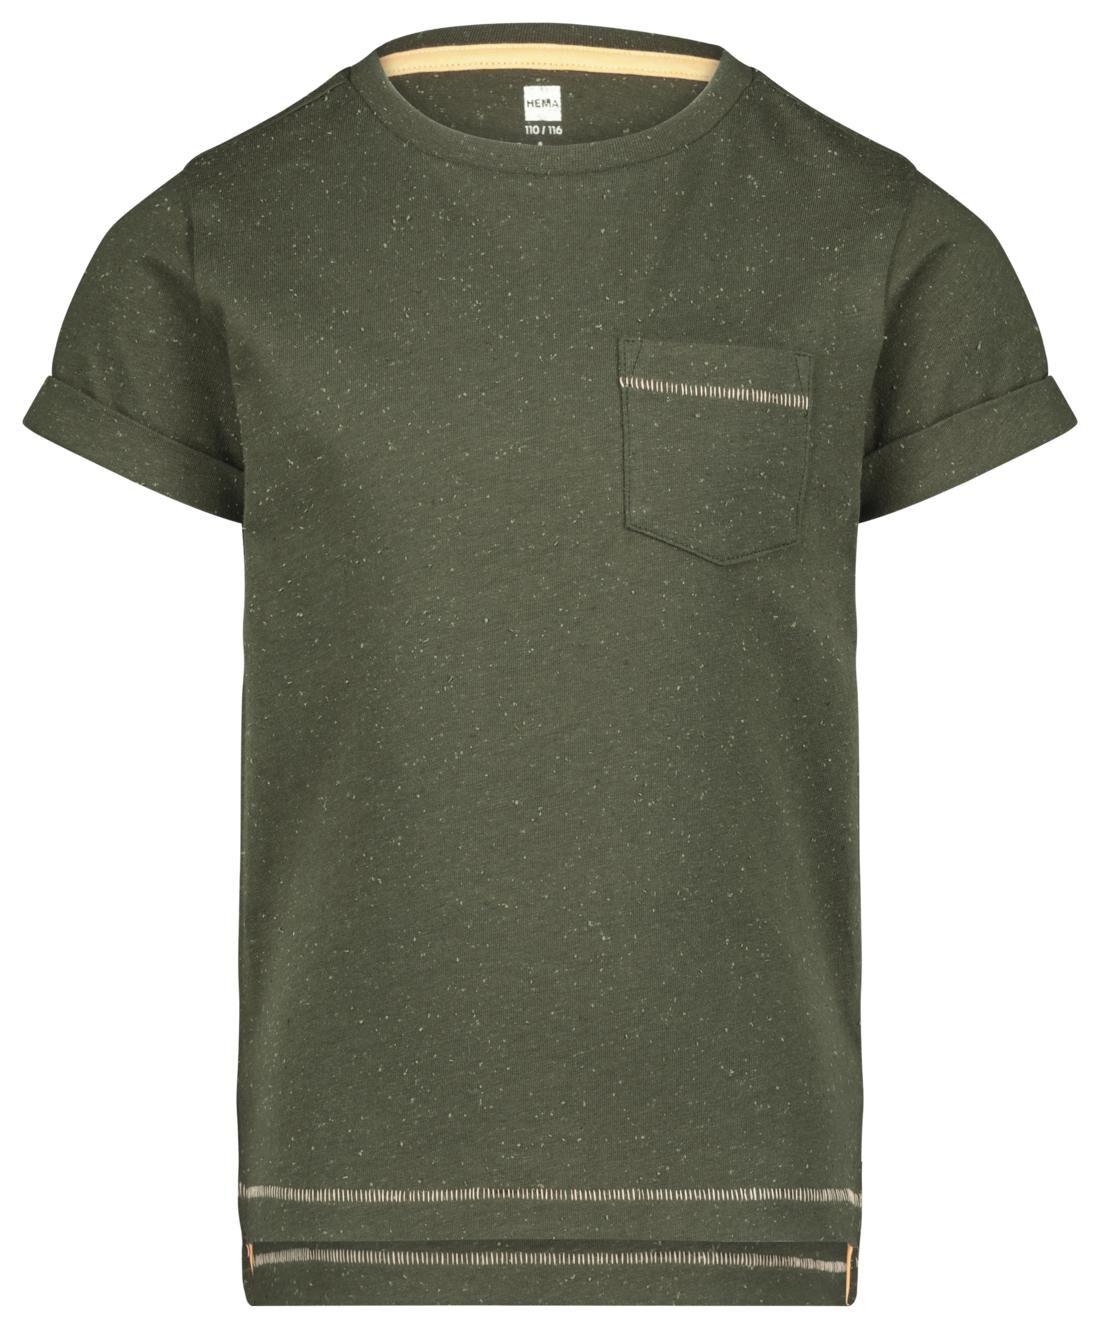 HEMA Kinder T-shirt Legergroen (legergroen)